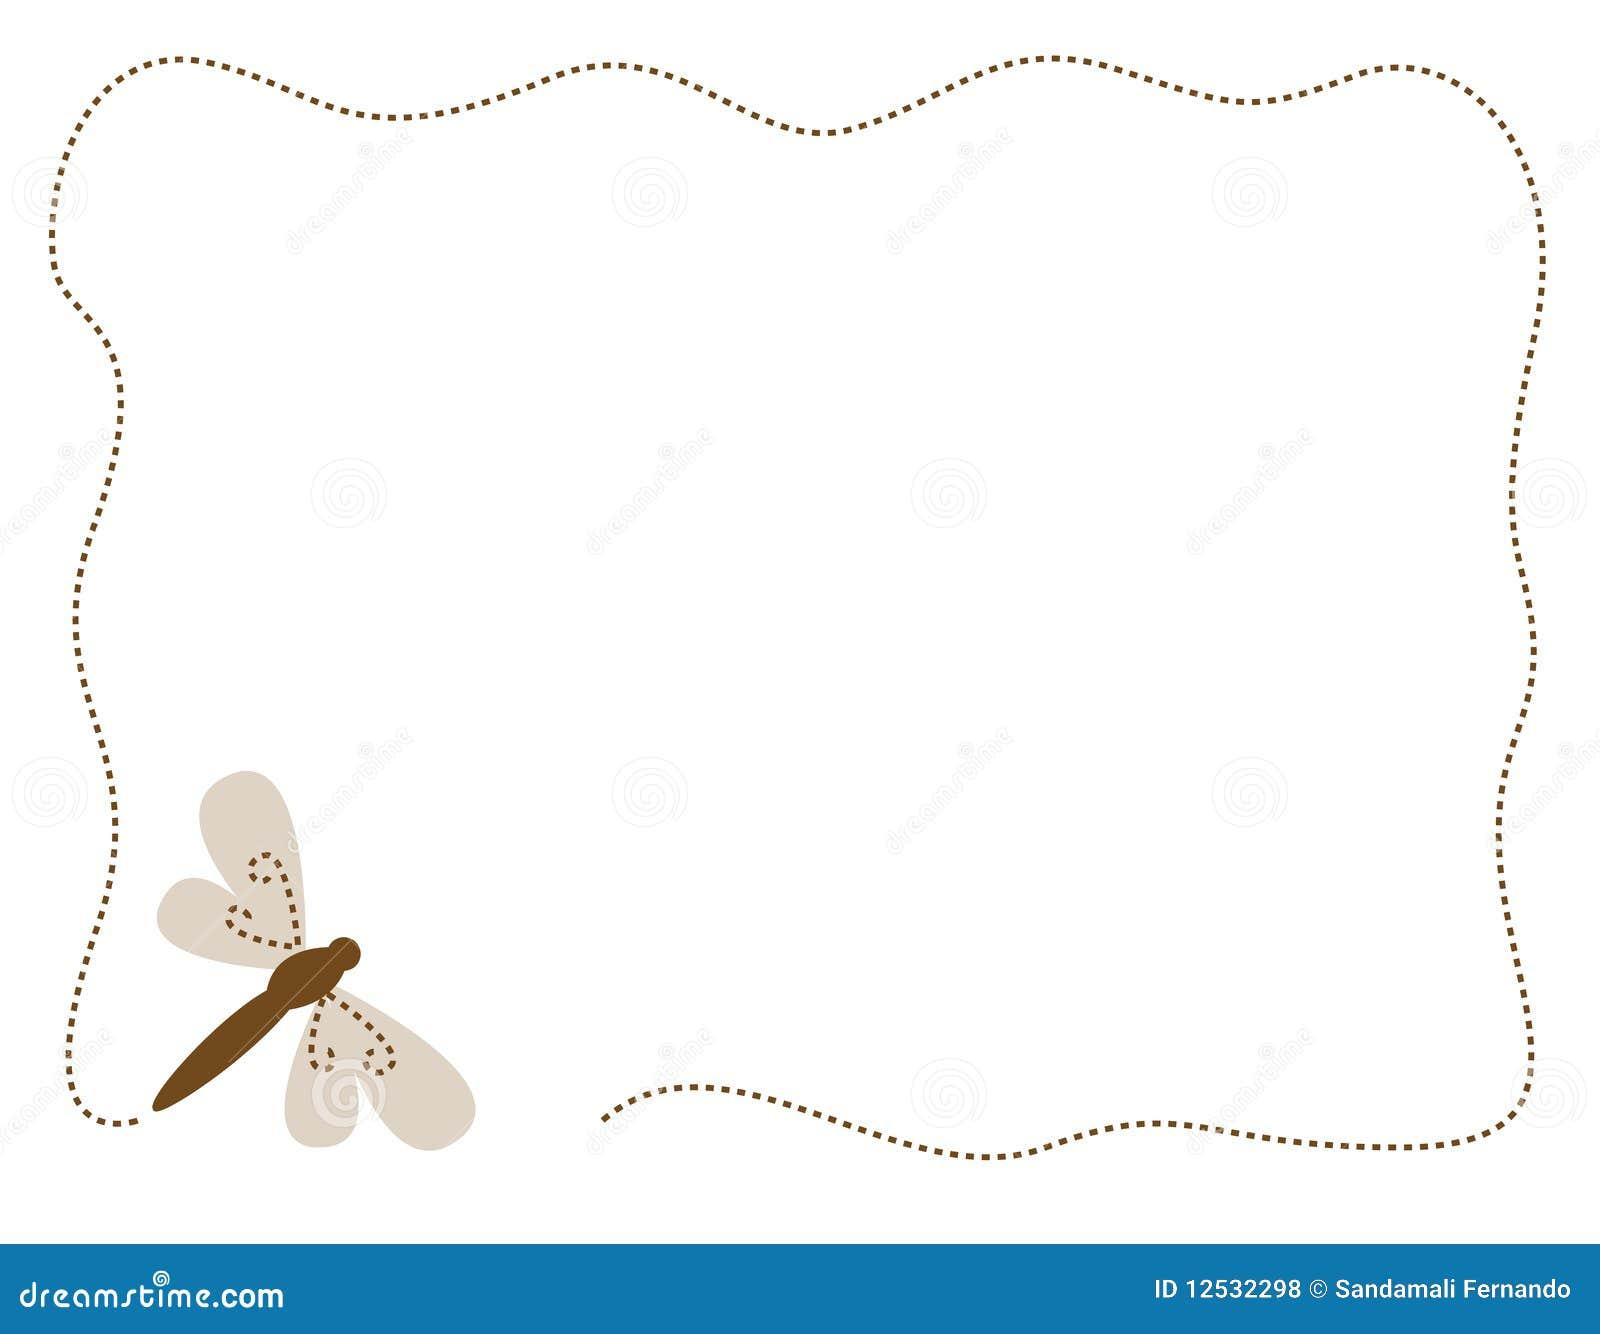 dragonfly border frame royalty free stock photos image